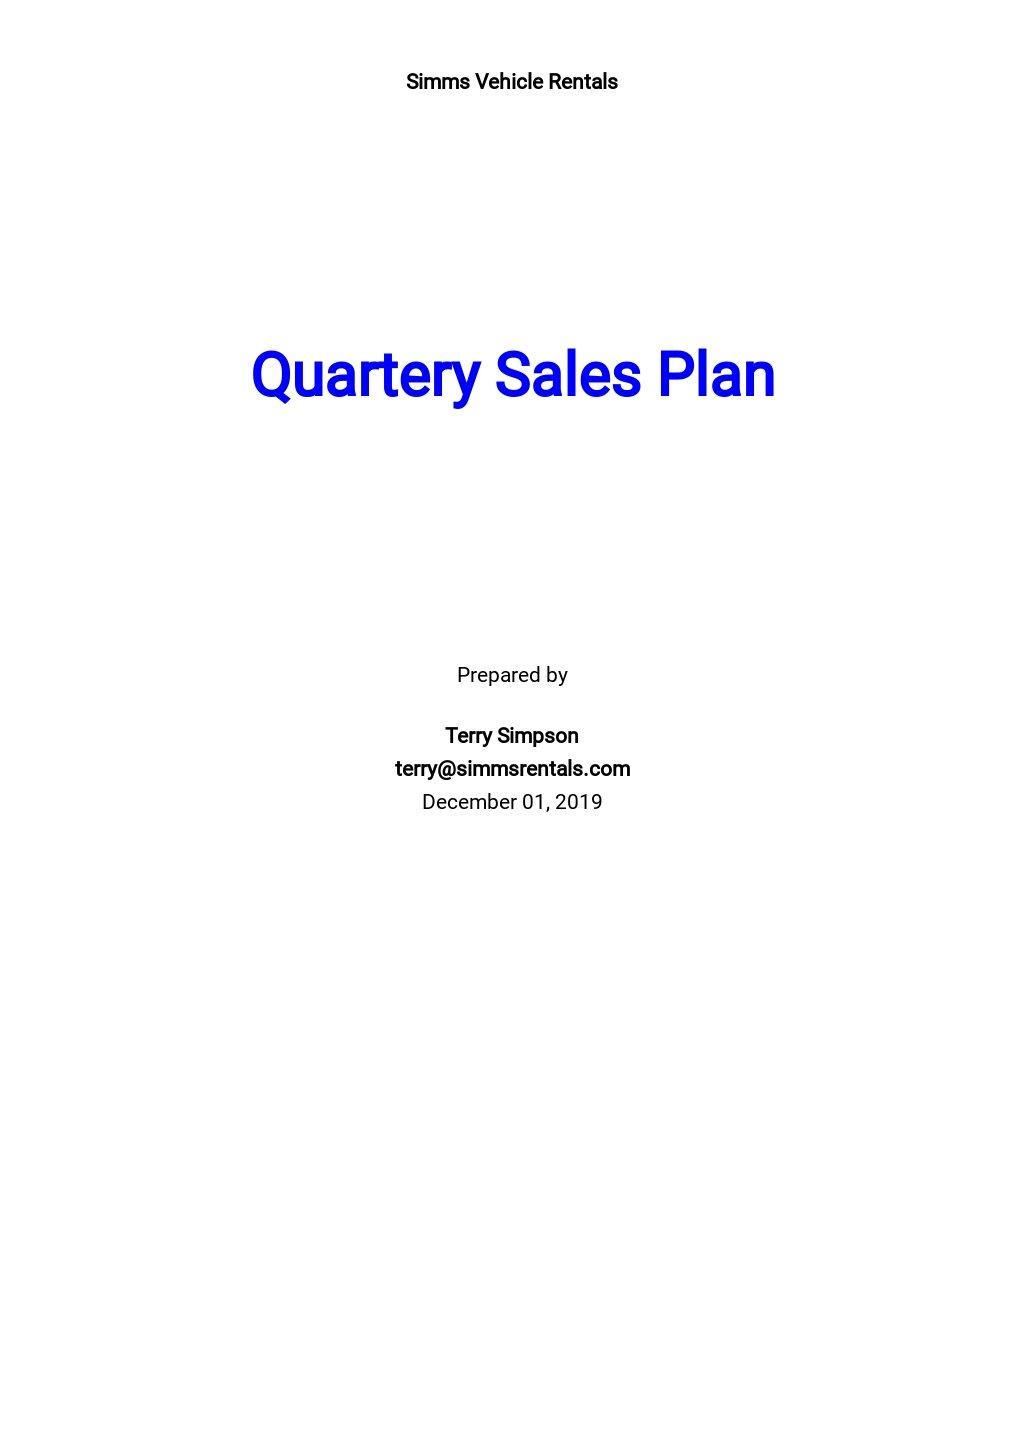 Quarterly Sales Plan Template